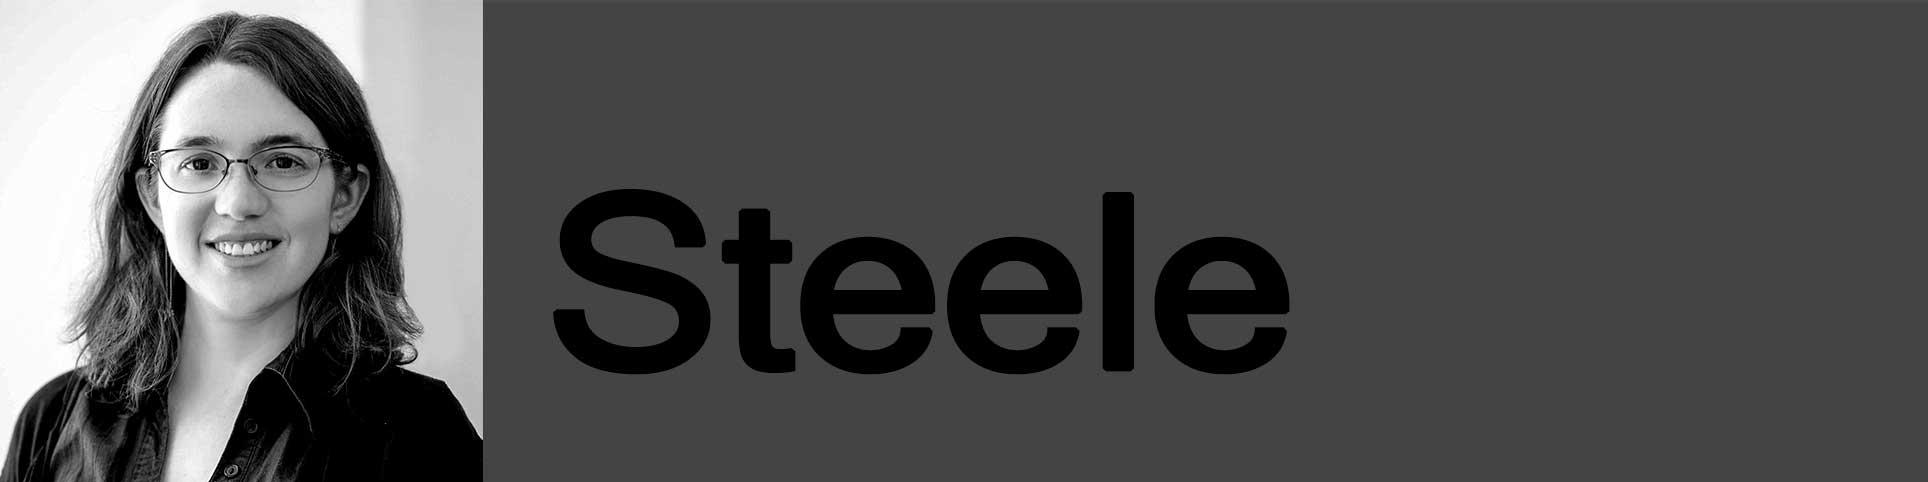 steeleHeader.jpg